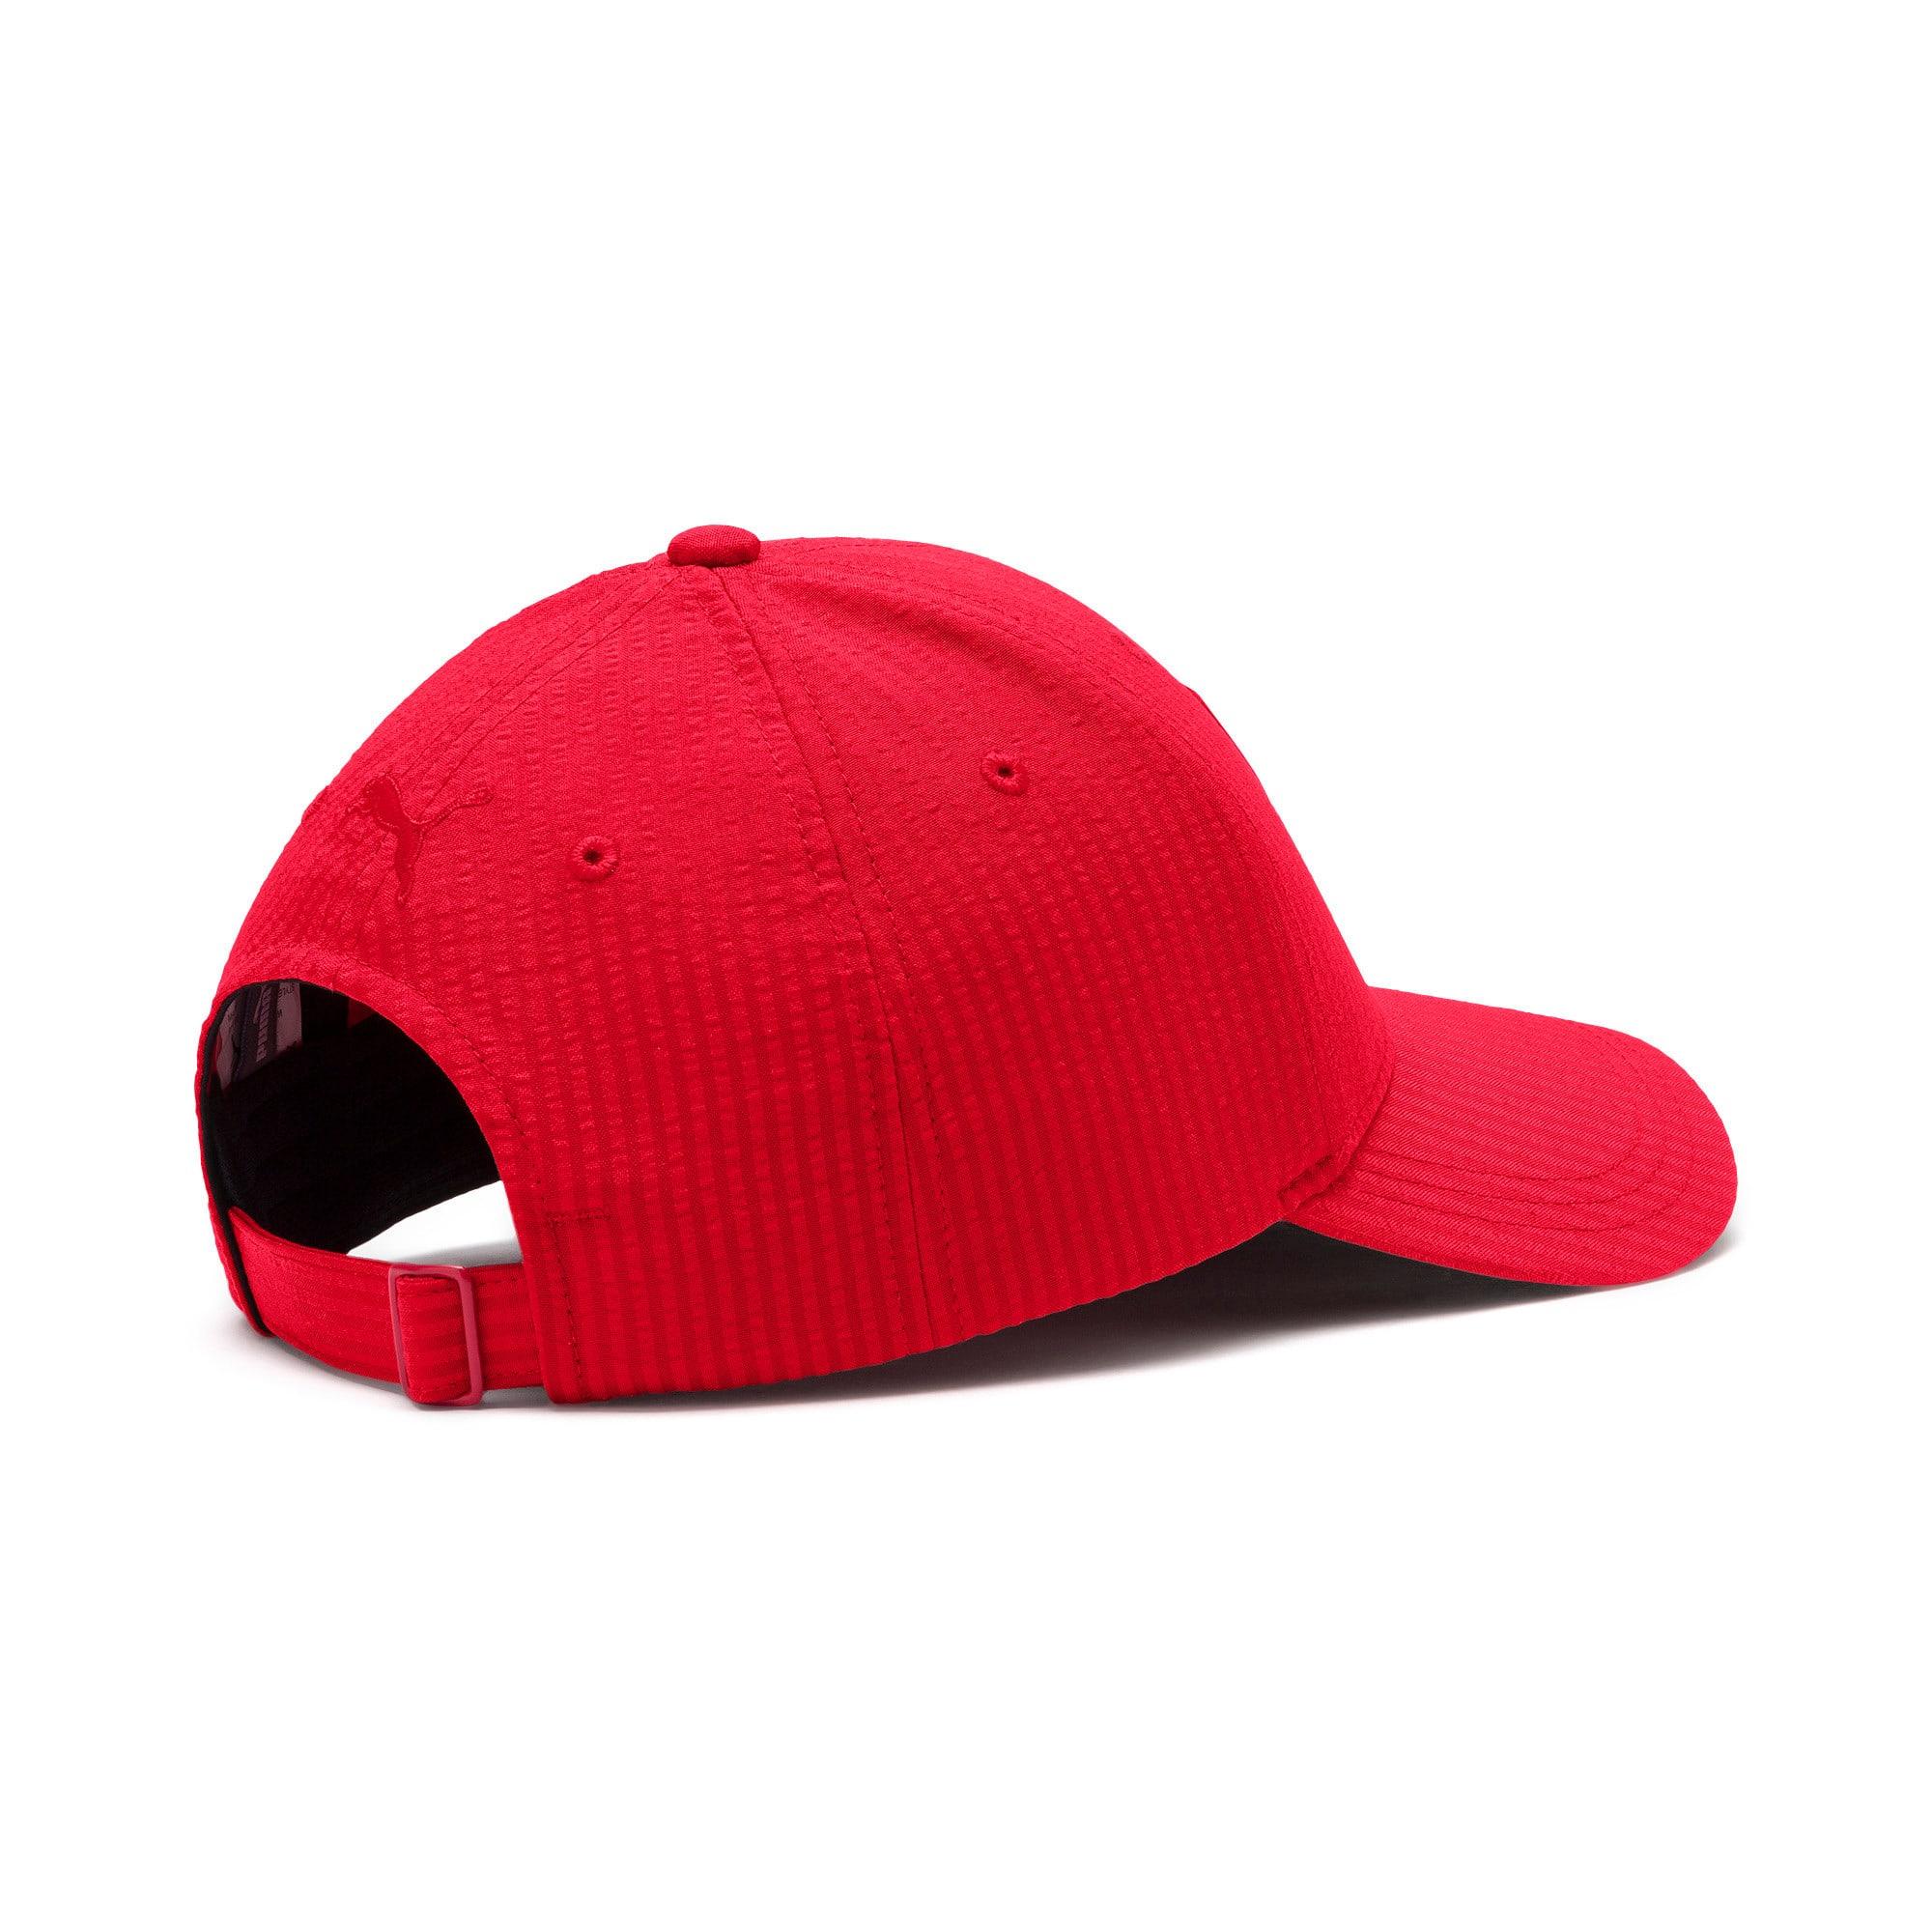 Thumbnail 3 of Ferrari Lifestyle Baseball Cap, Rosso Corsa, medium